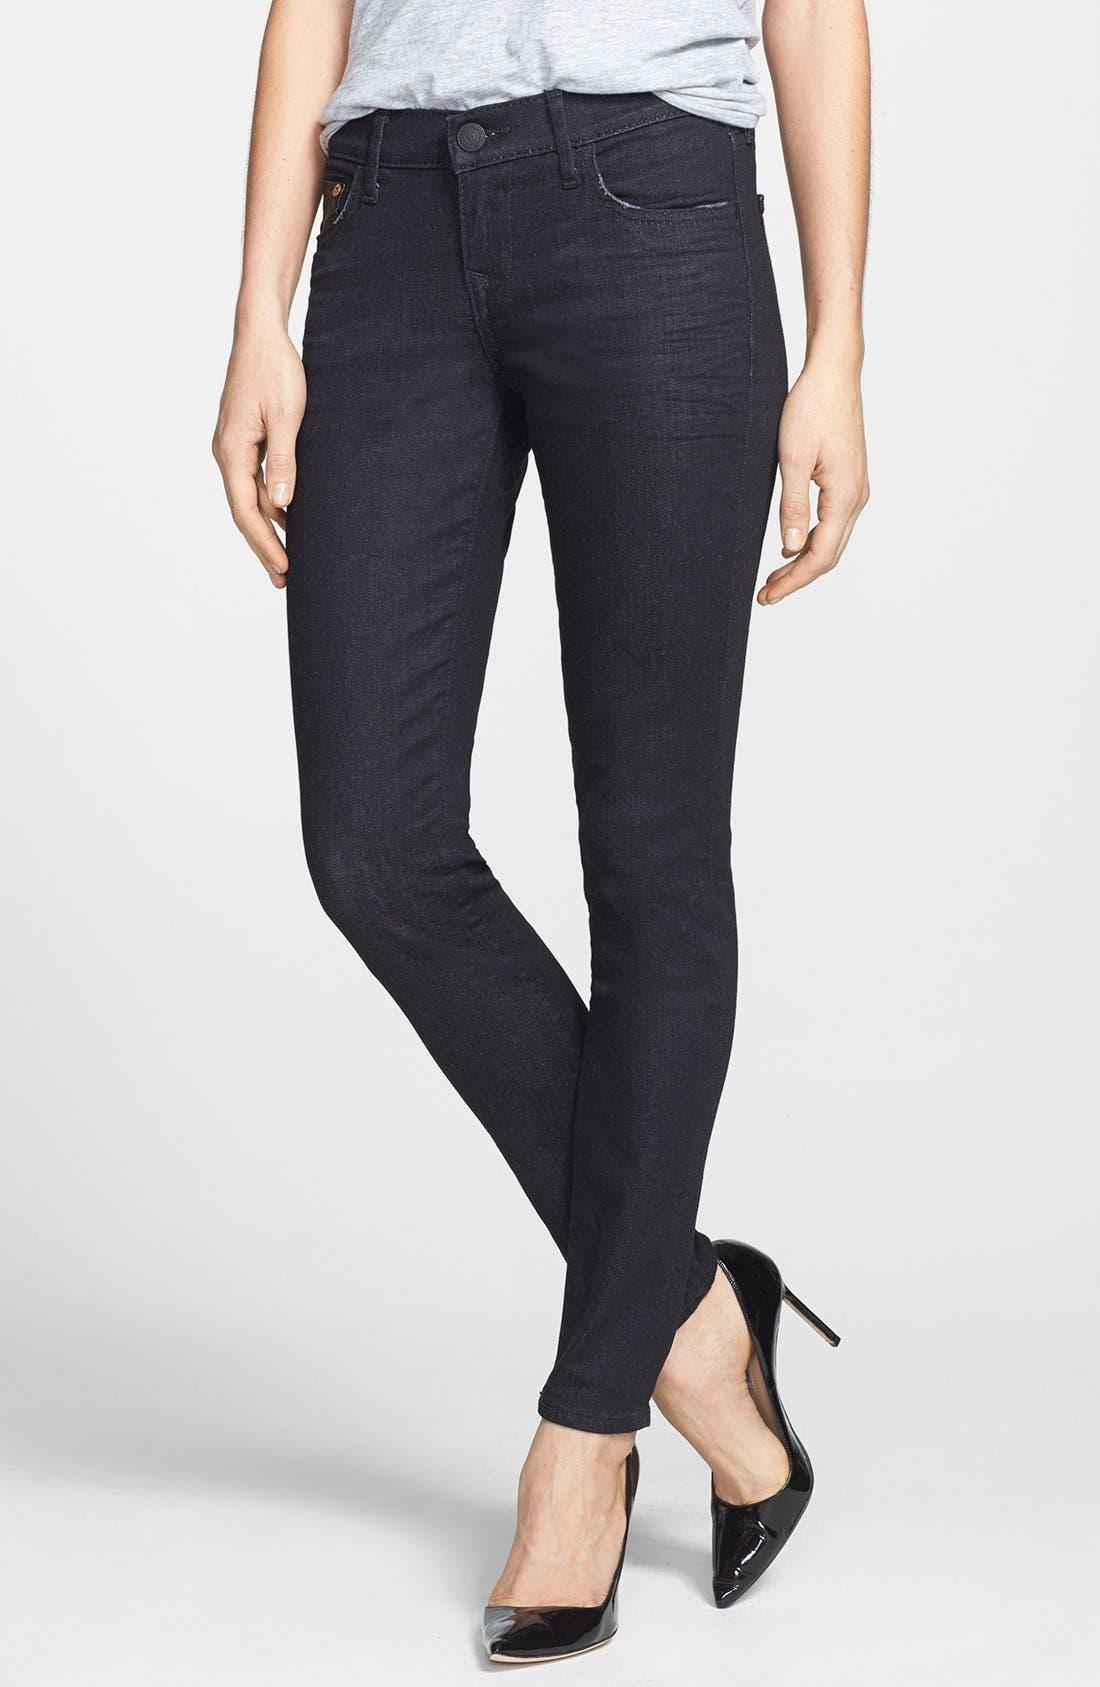 Alternate Image 1 Selected - True Religion Brand Jeans 'Casey' Skinny Jeans (Black Smoke Vintage)